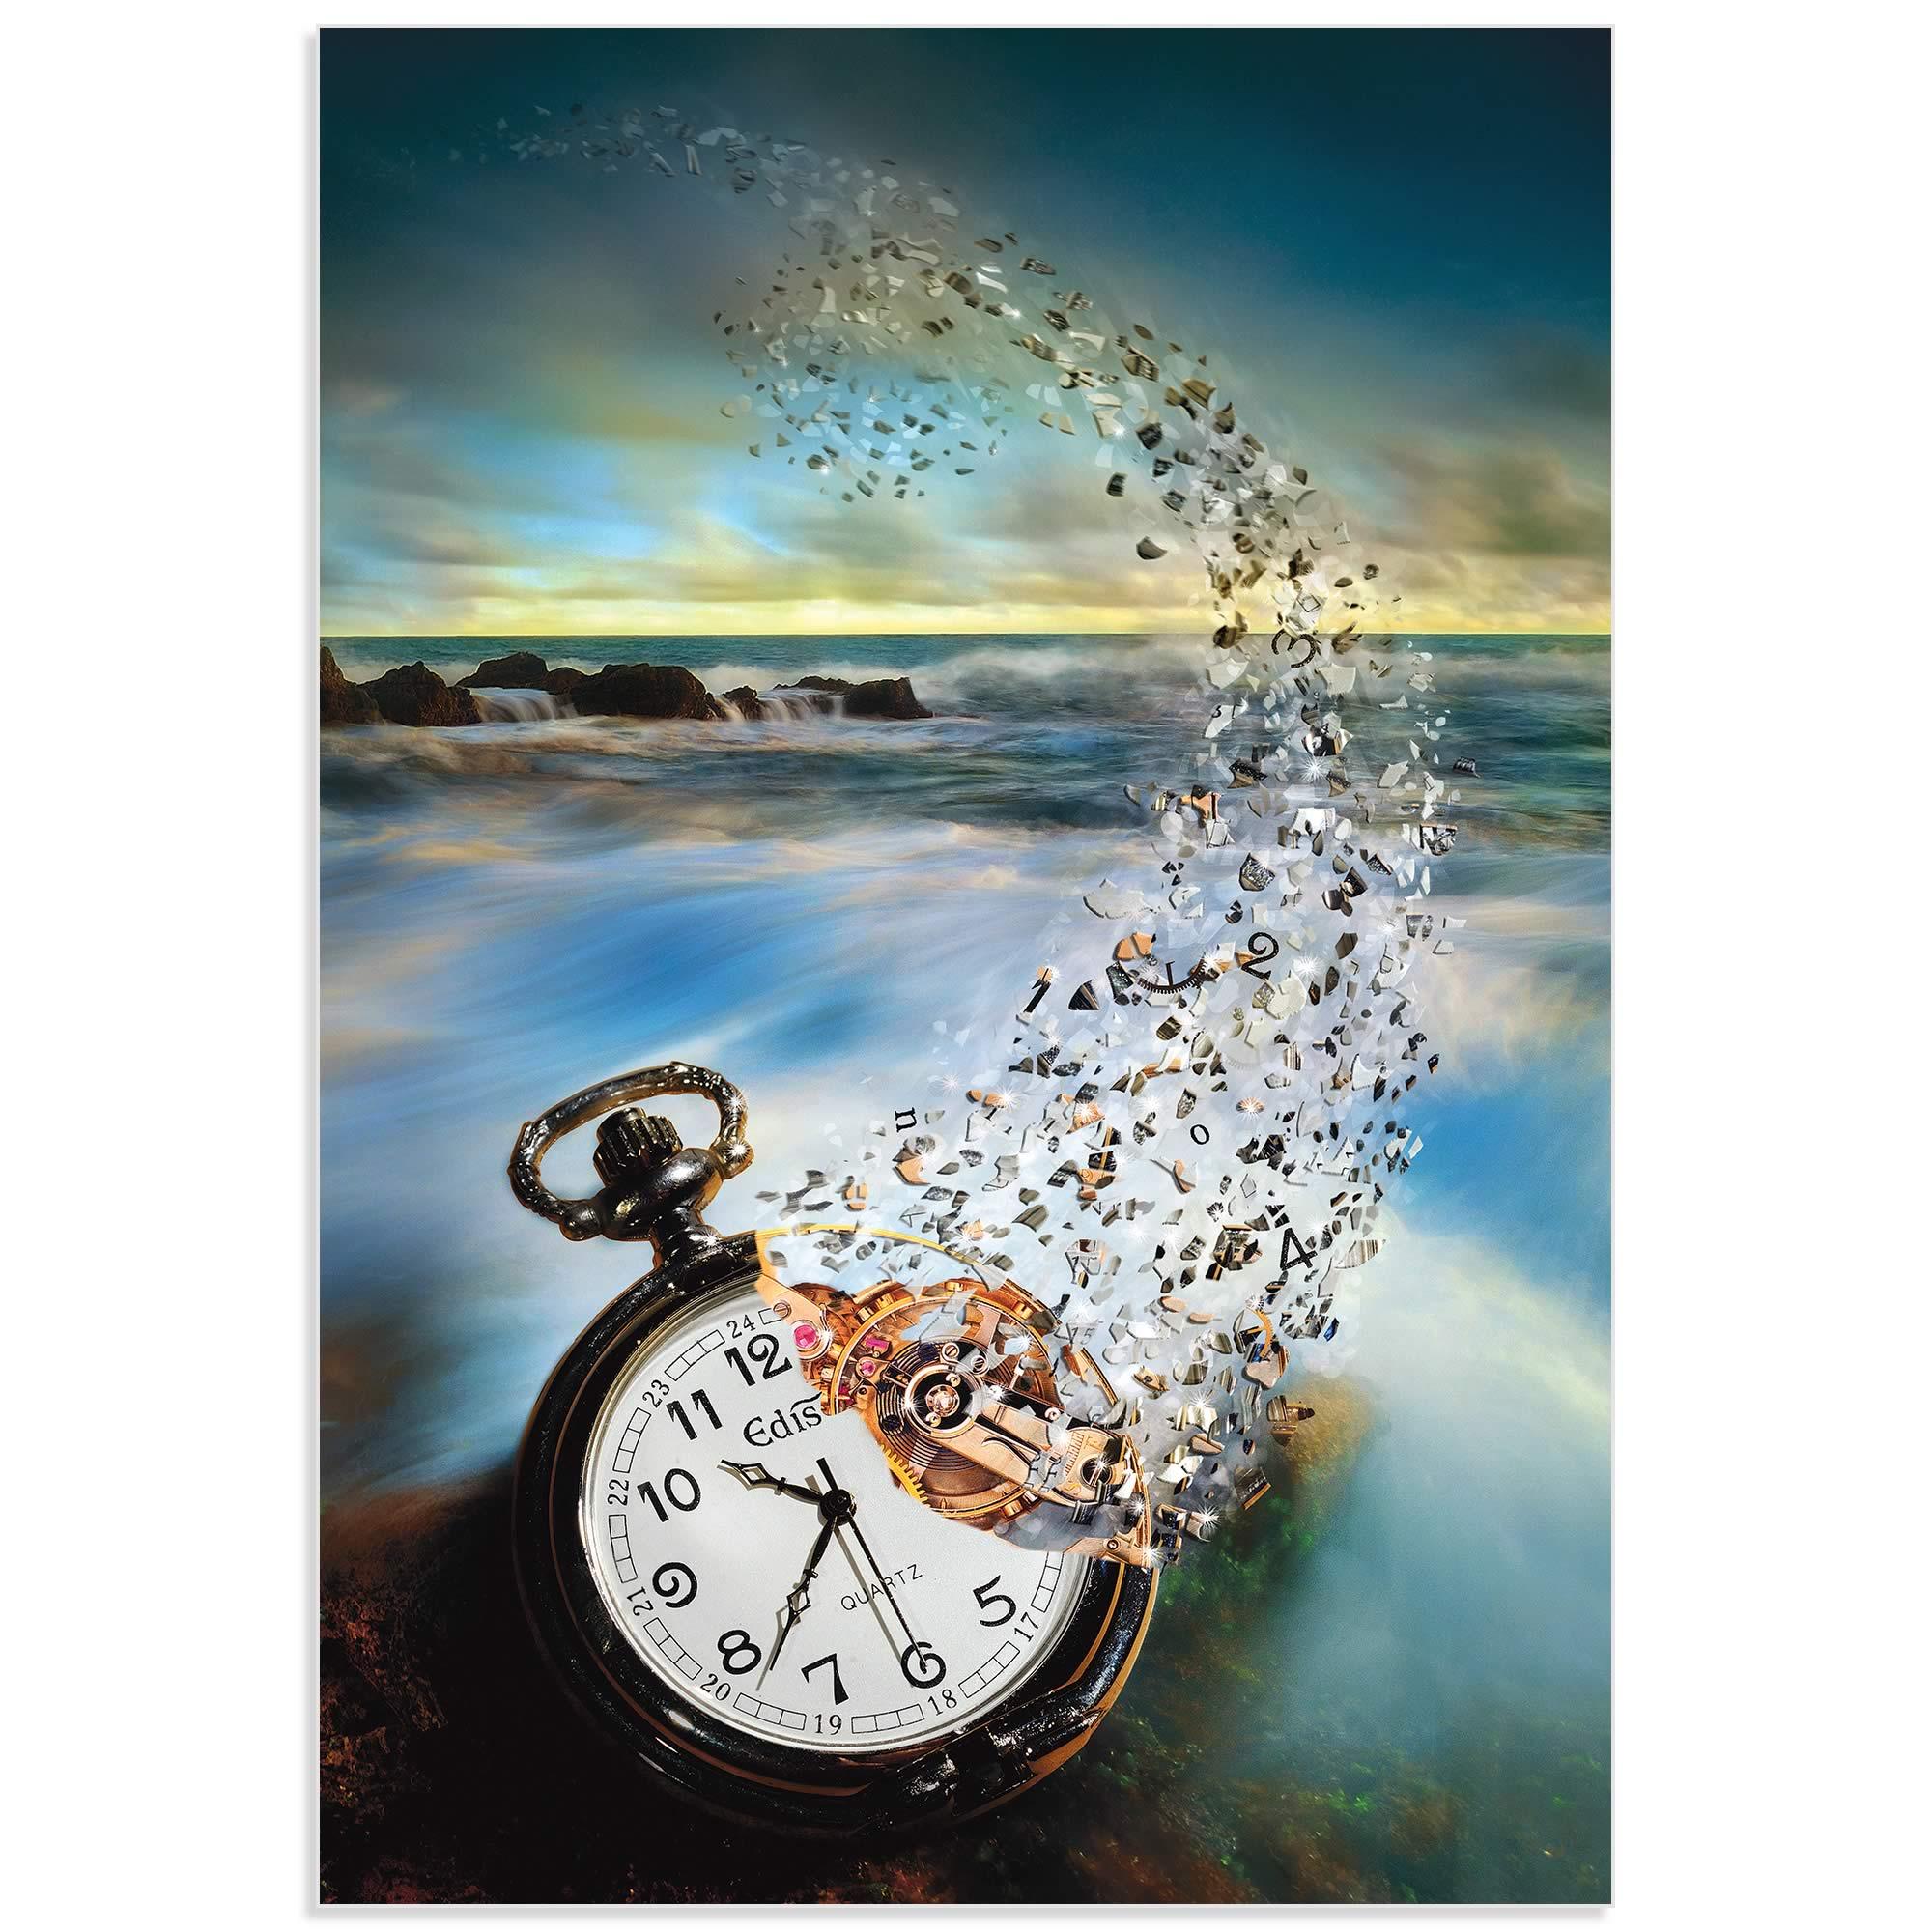 The Vanishing Time by Sandy Wijaya - Steam Punk Art on Metal or Acrylic - Alternate View 2